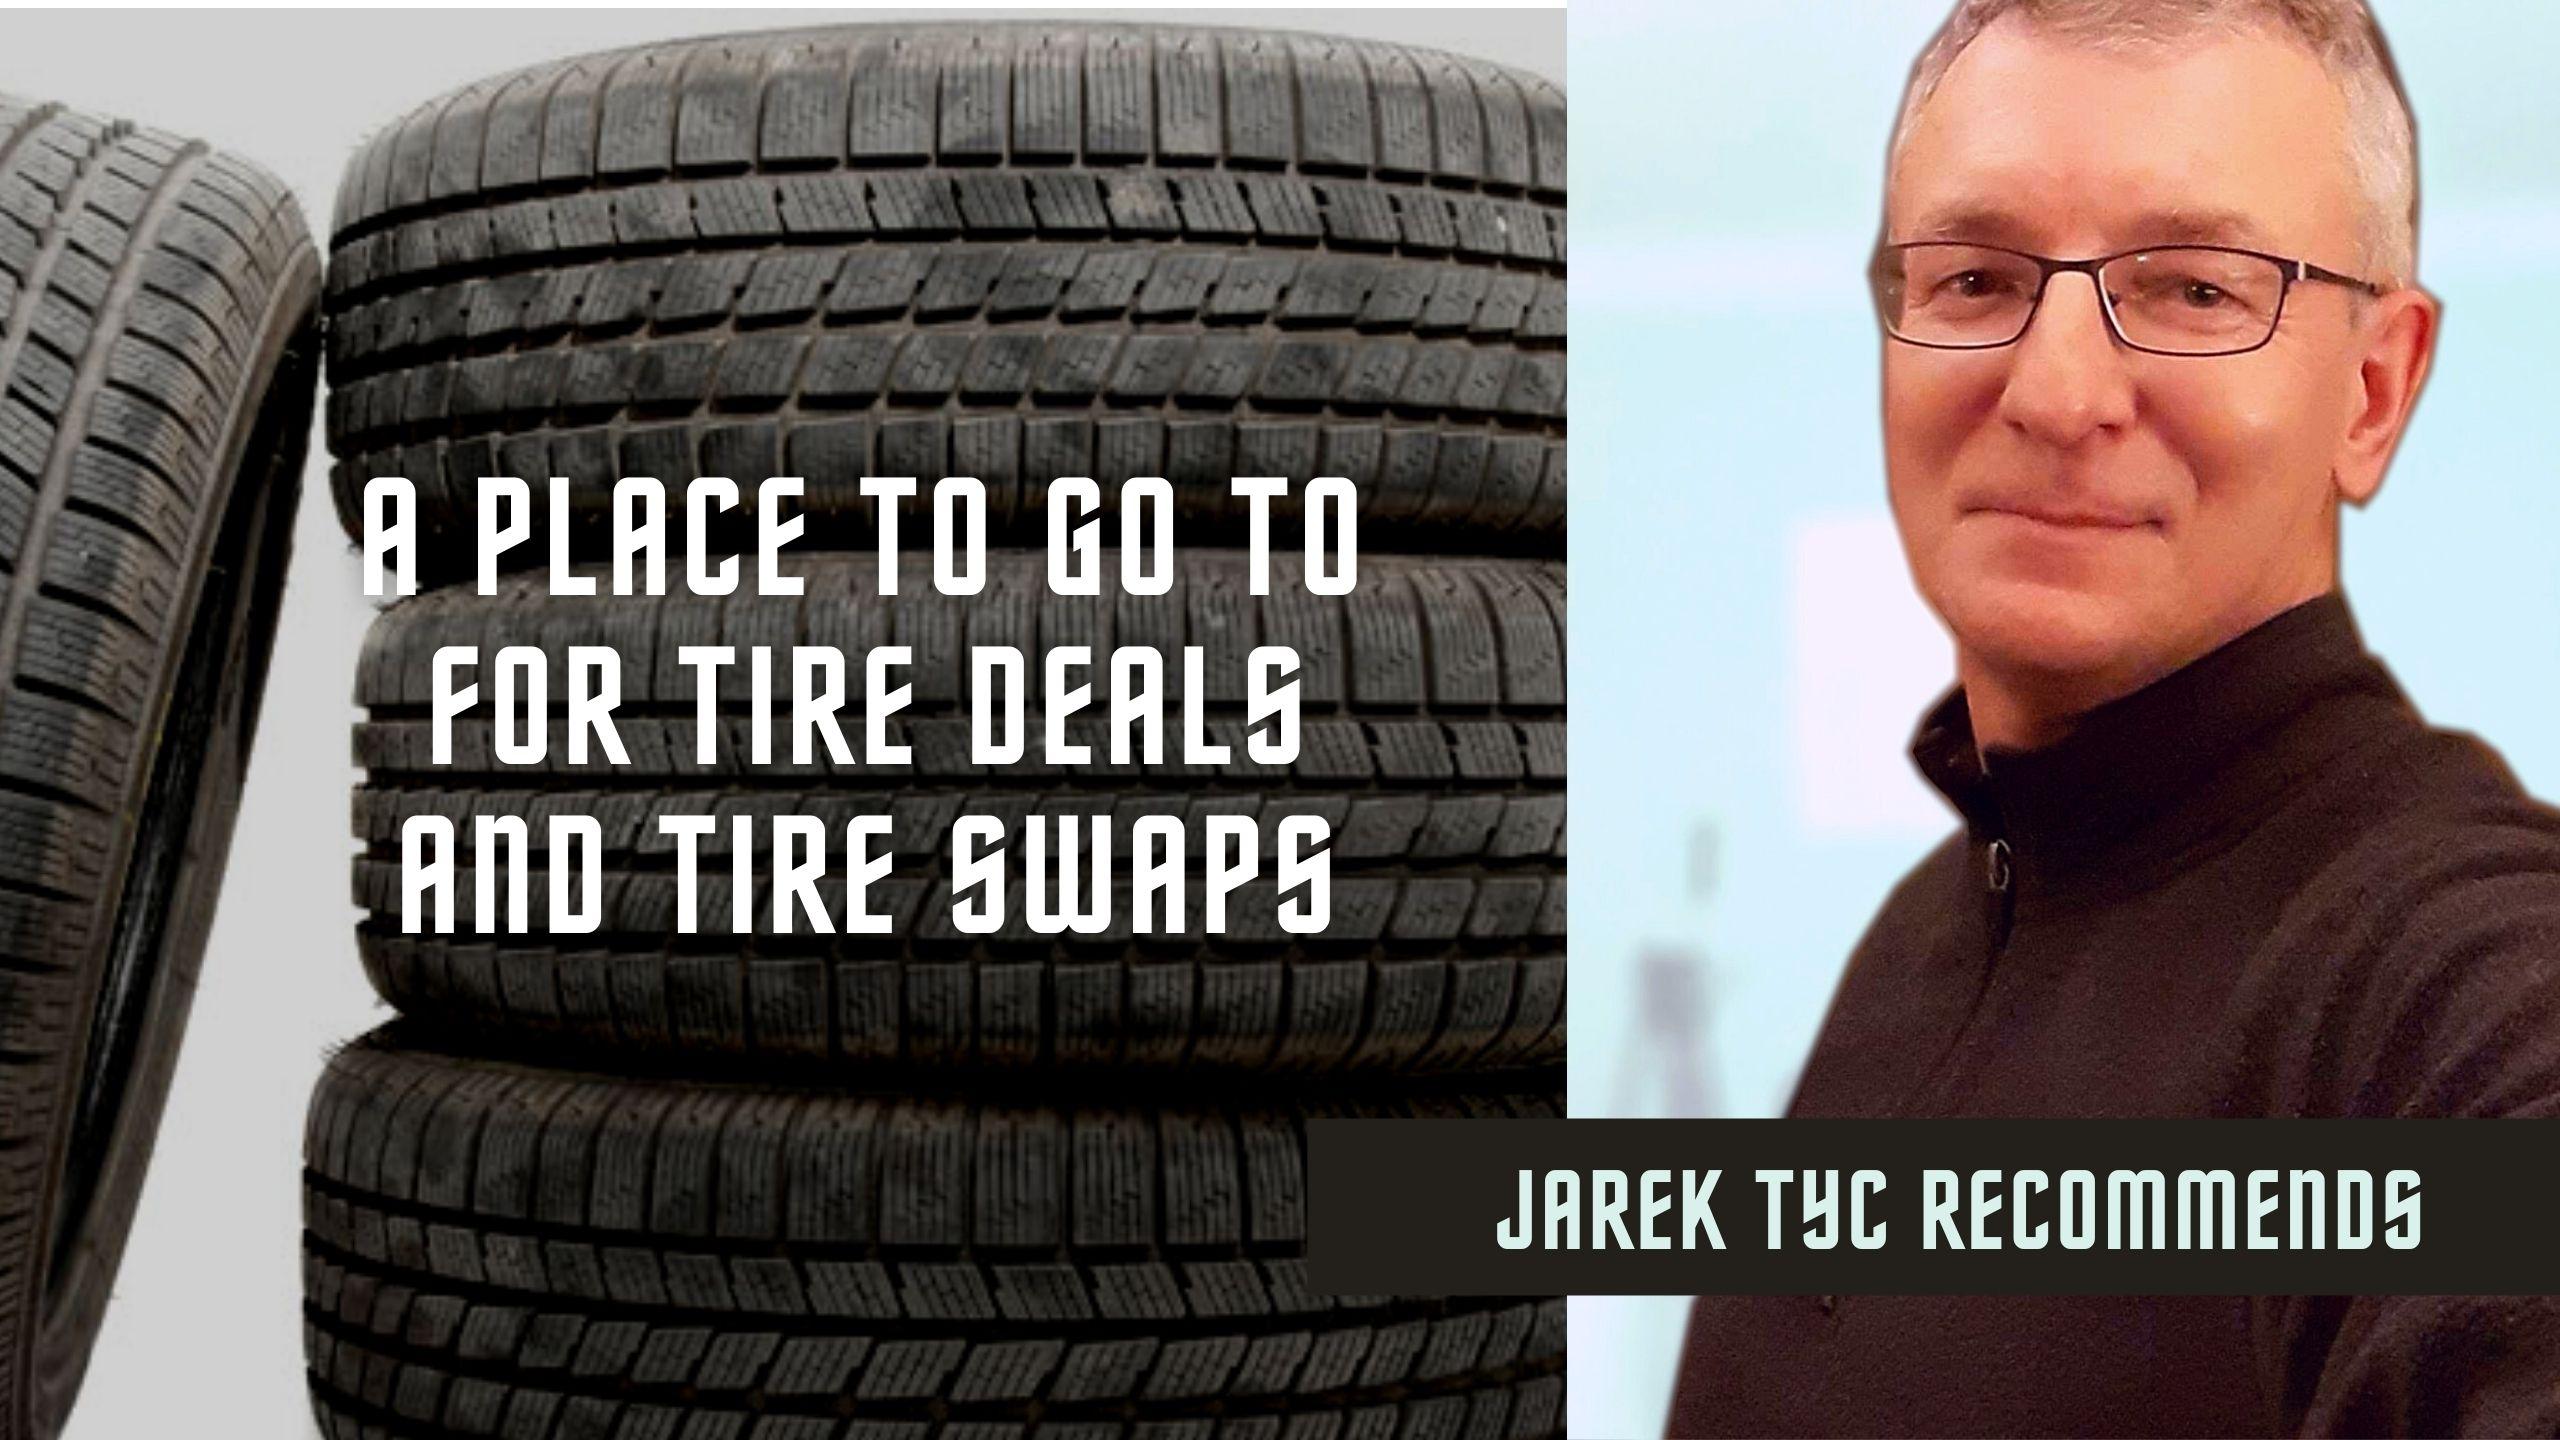 Jarek recommends TIRE TRADE (2)